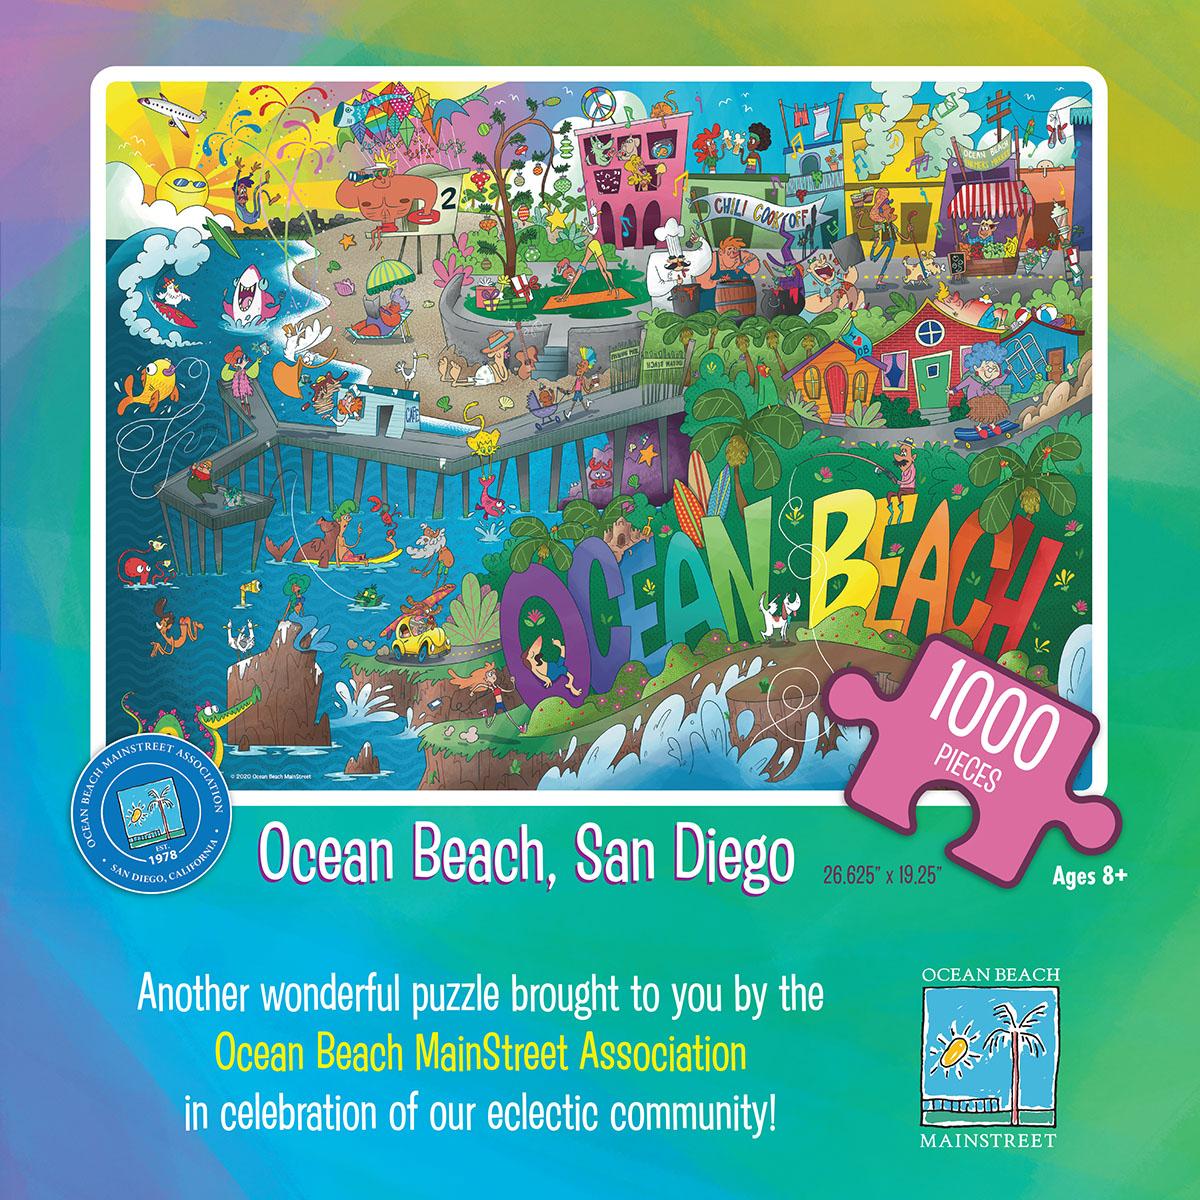 Ocean Beach Product: Puzzle - Ocean Beach, San Diego 2020